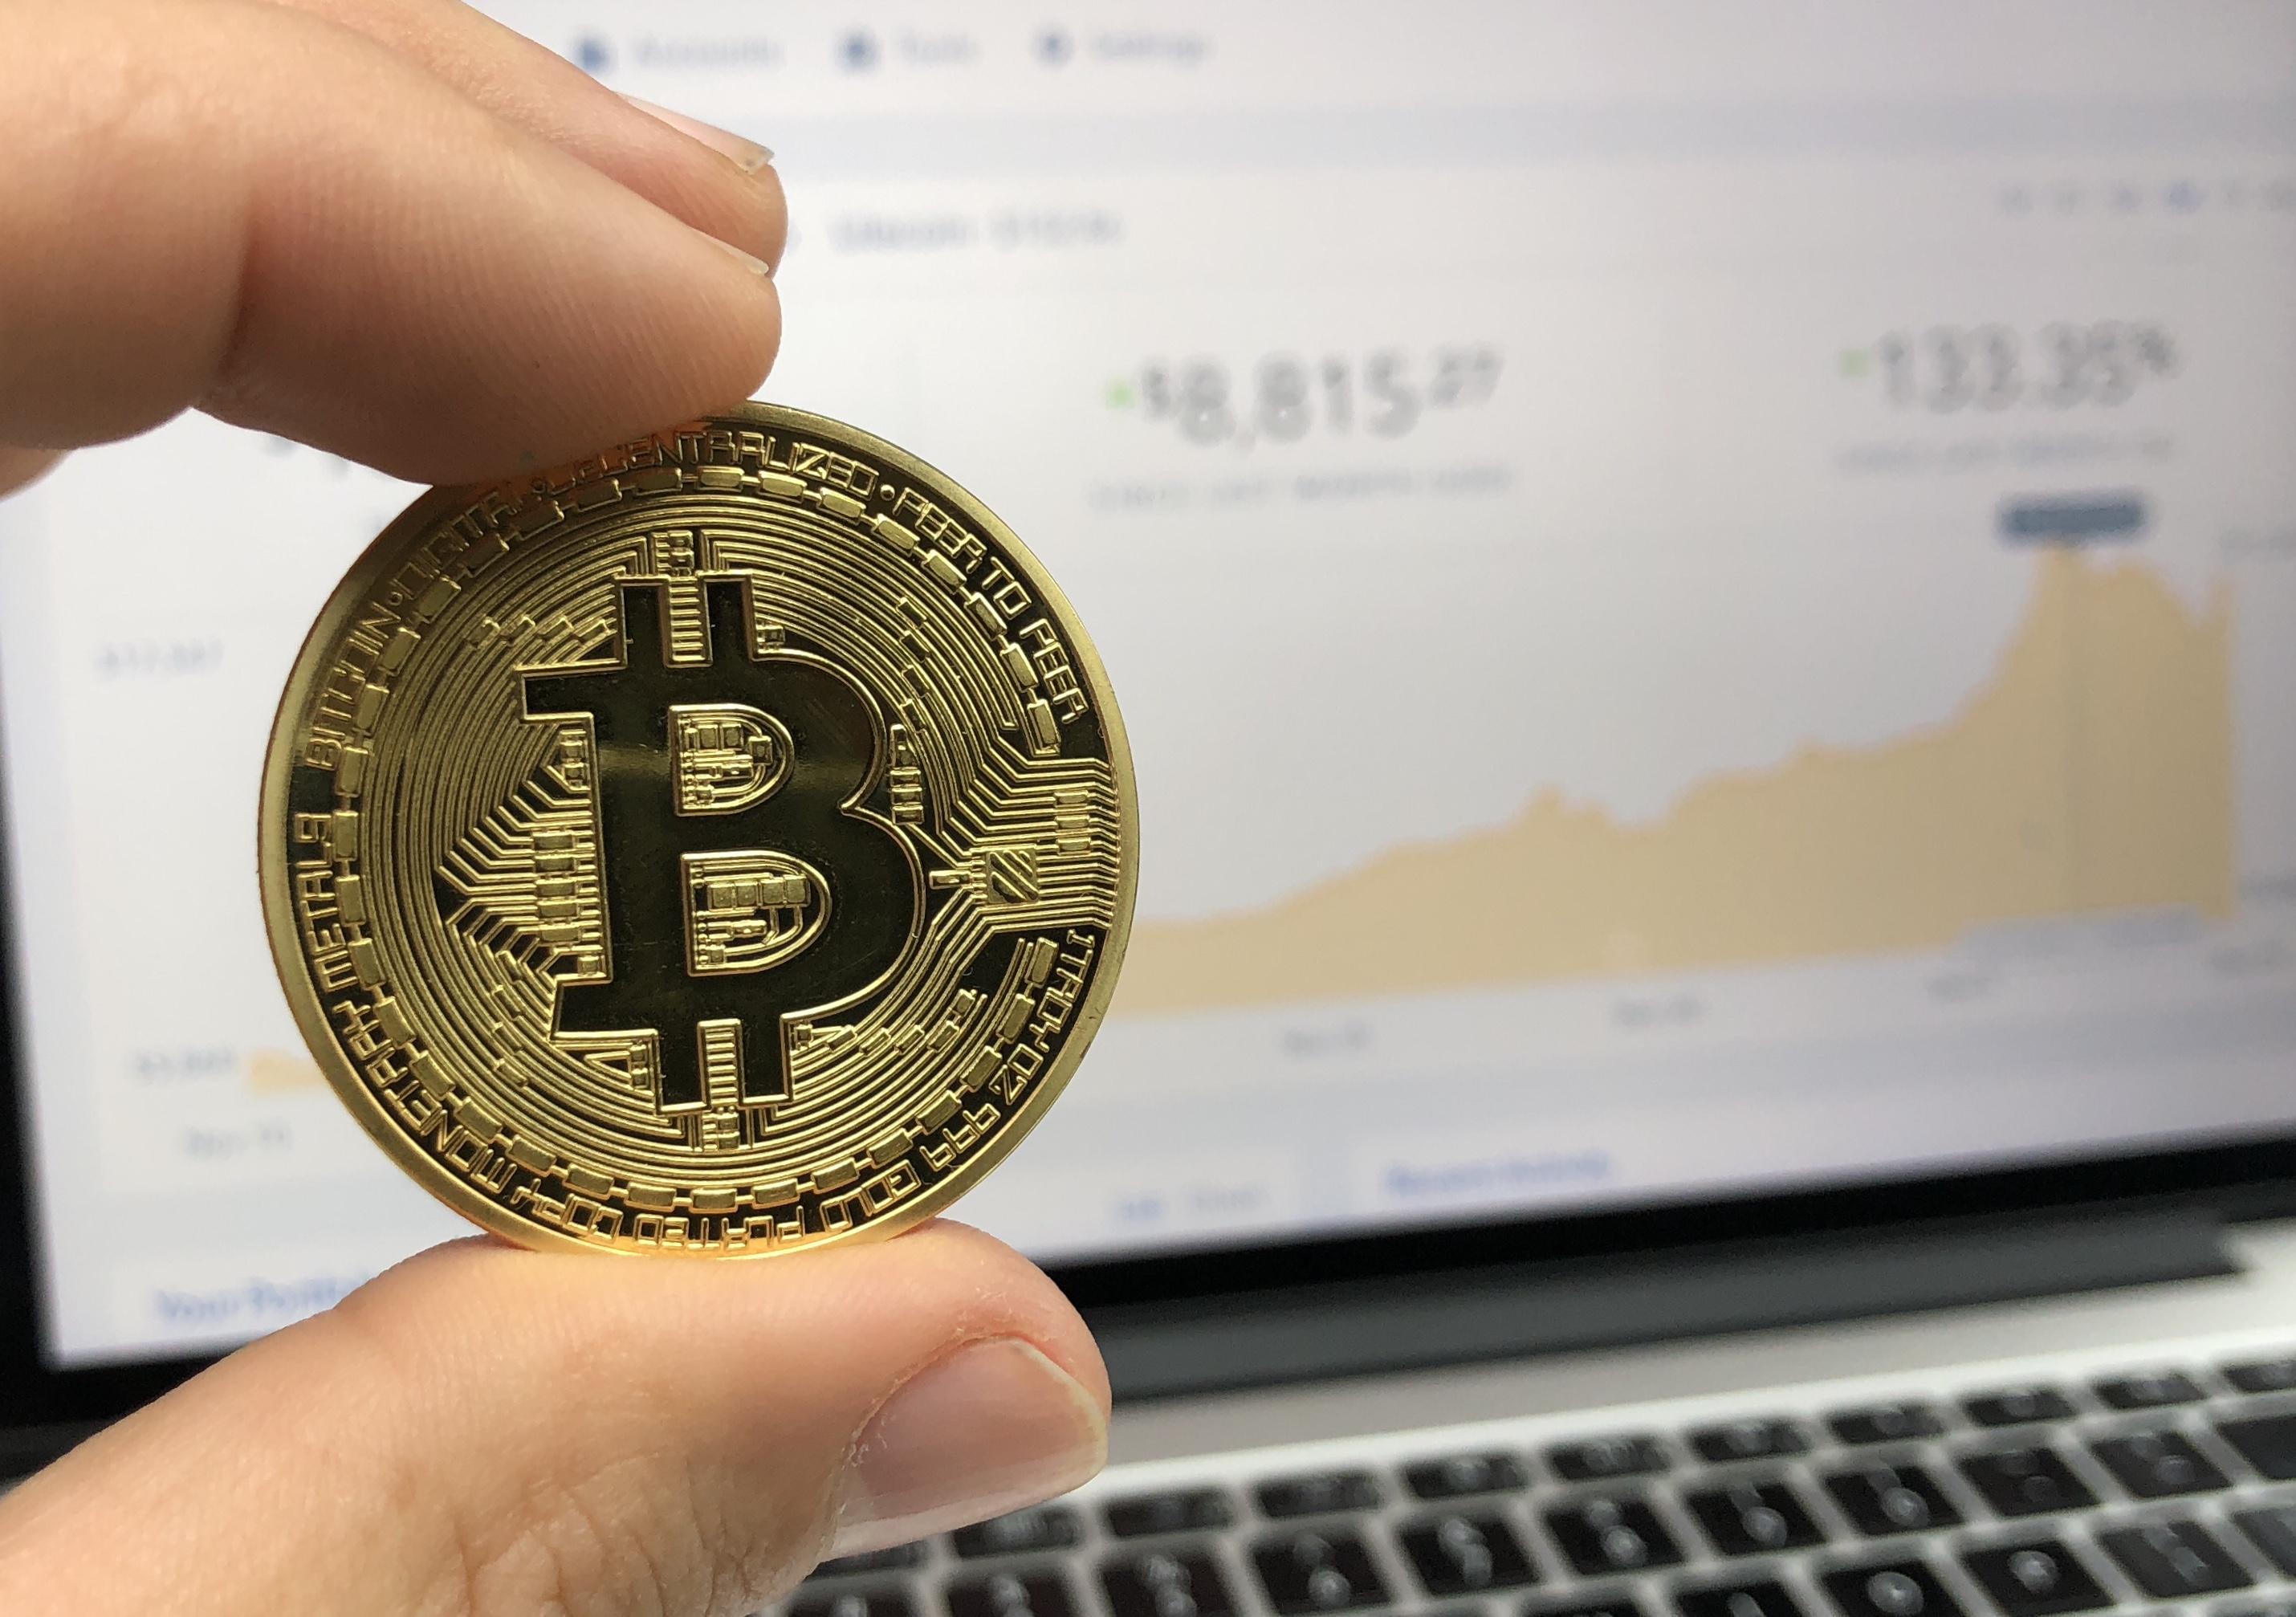 Circle即将发布稳定币USD Coin